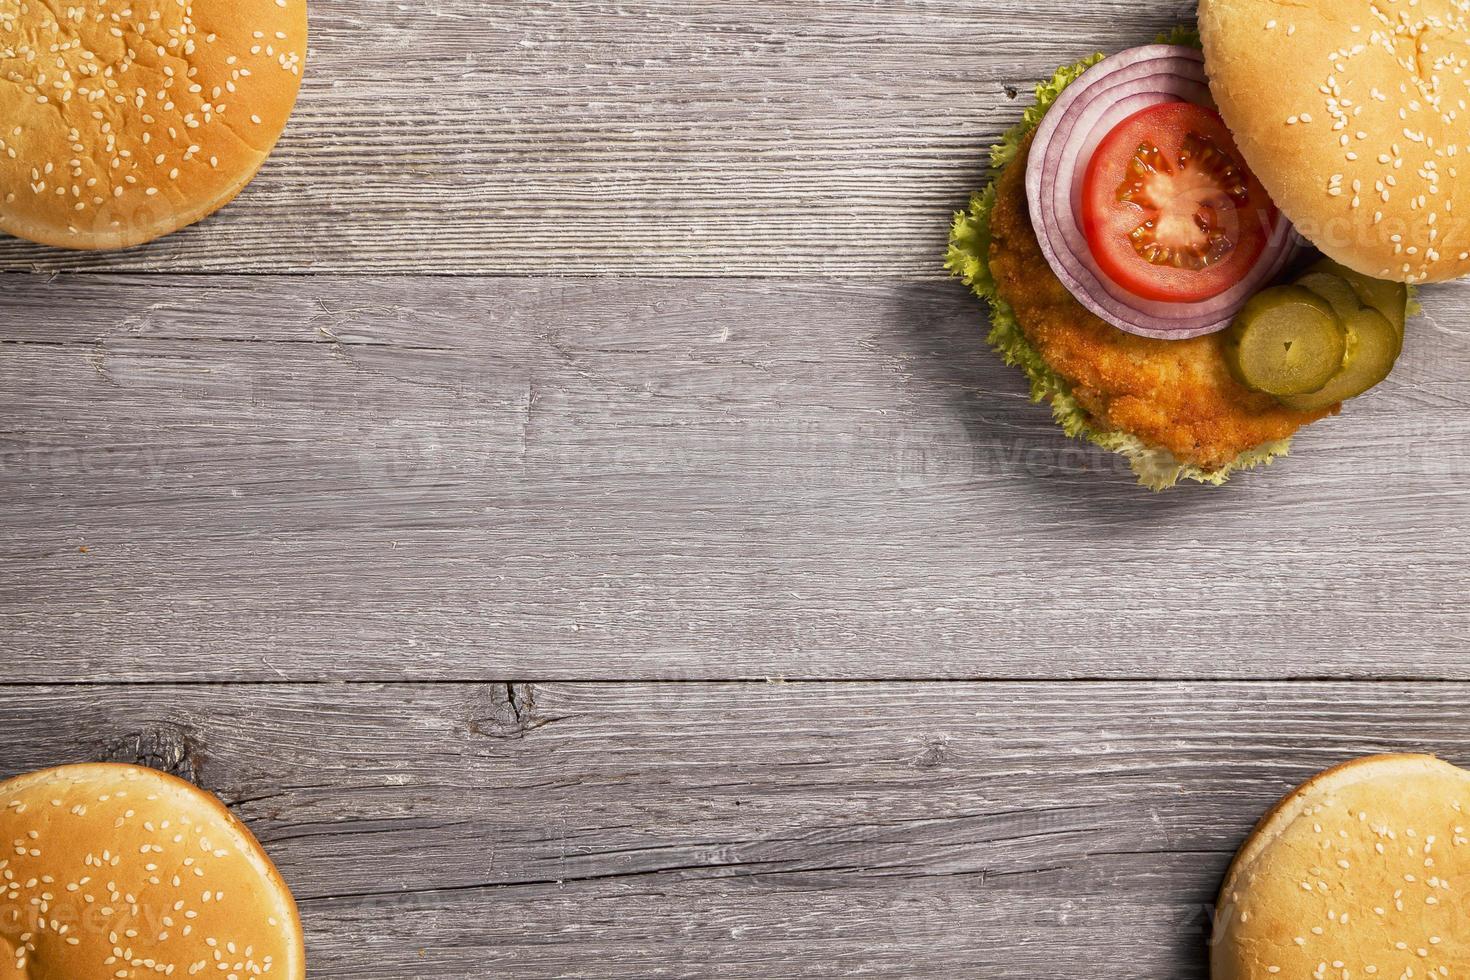 hamburguesa casera de pollo con lechuga, tomate y cebolla foto